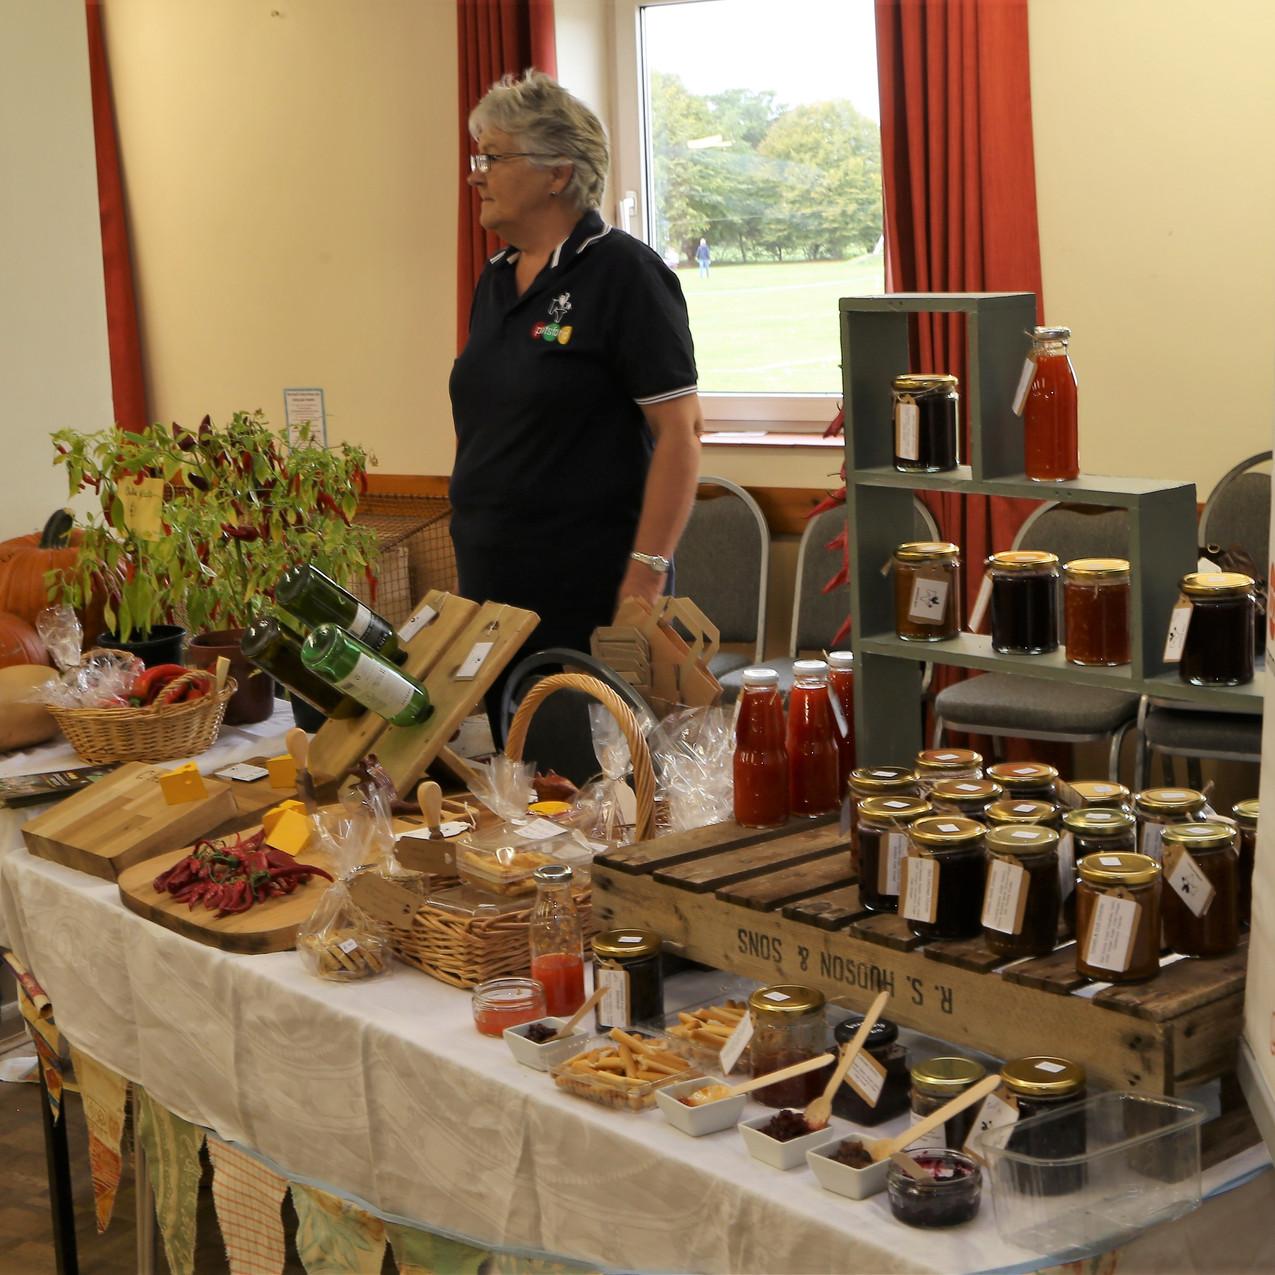 Potsford produce